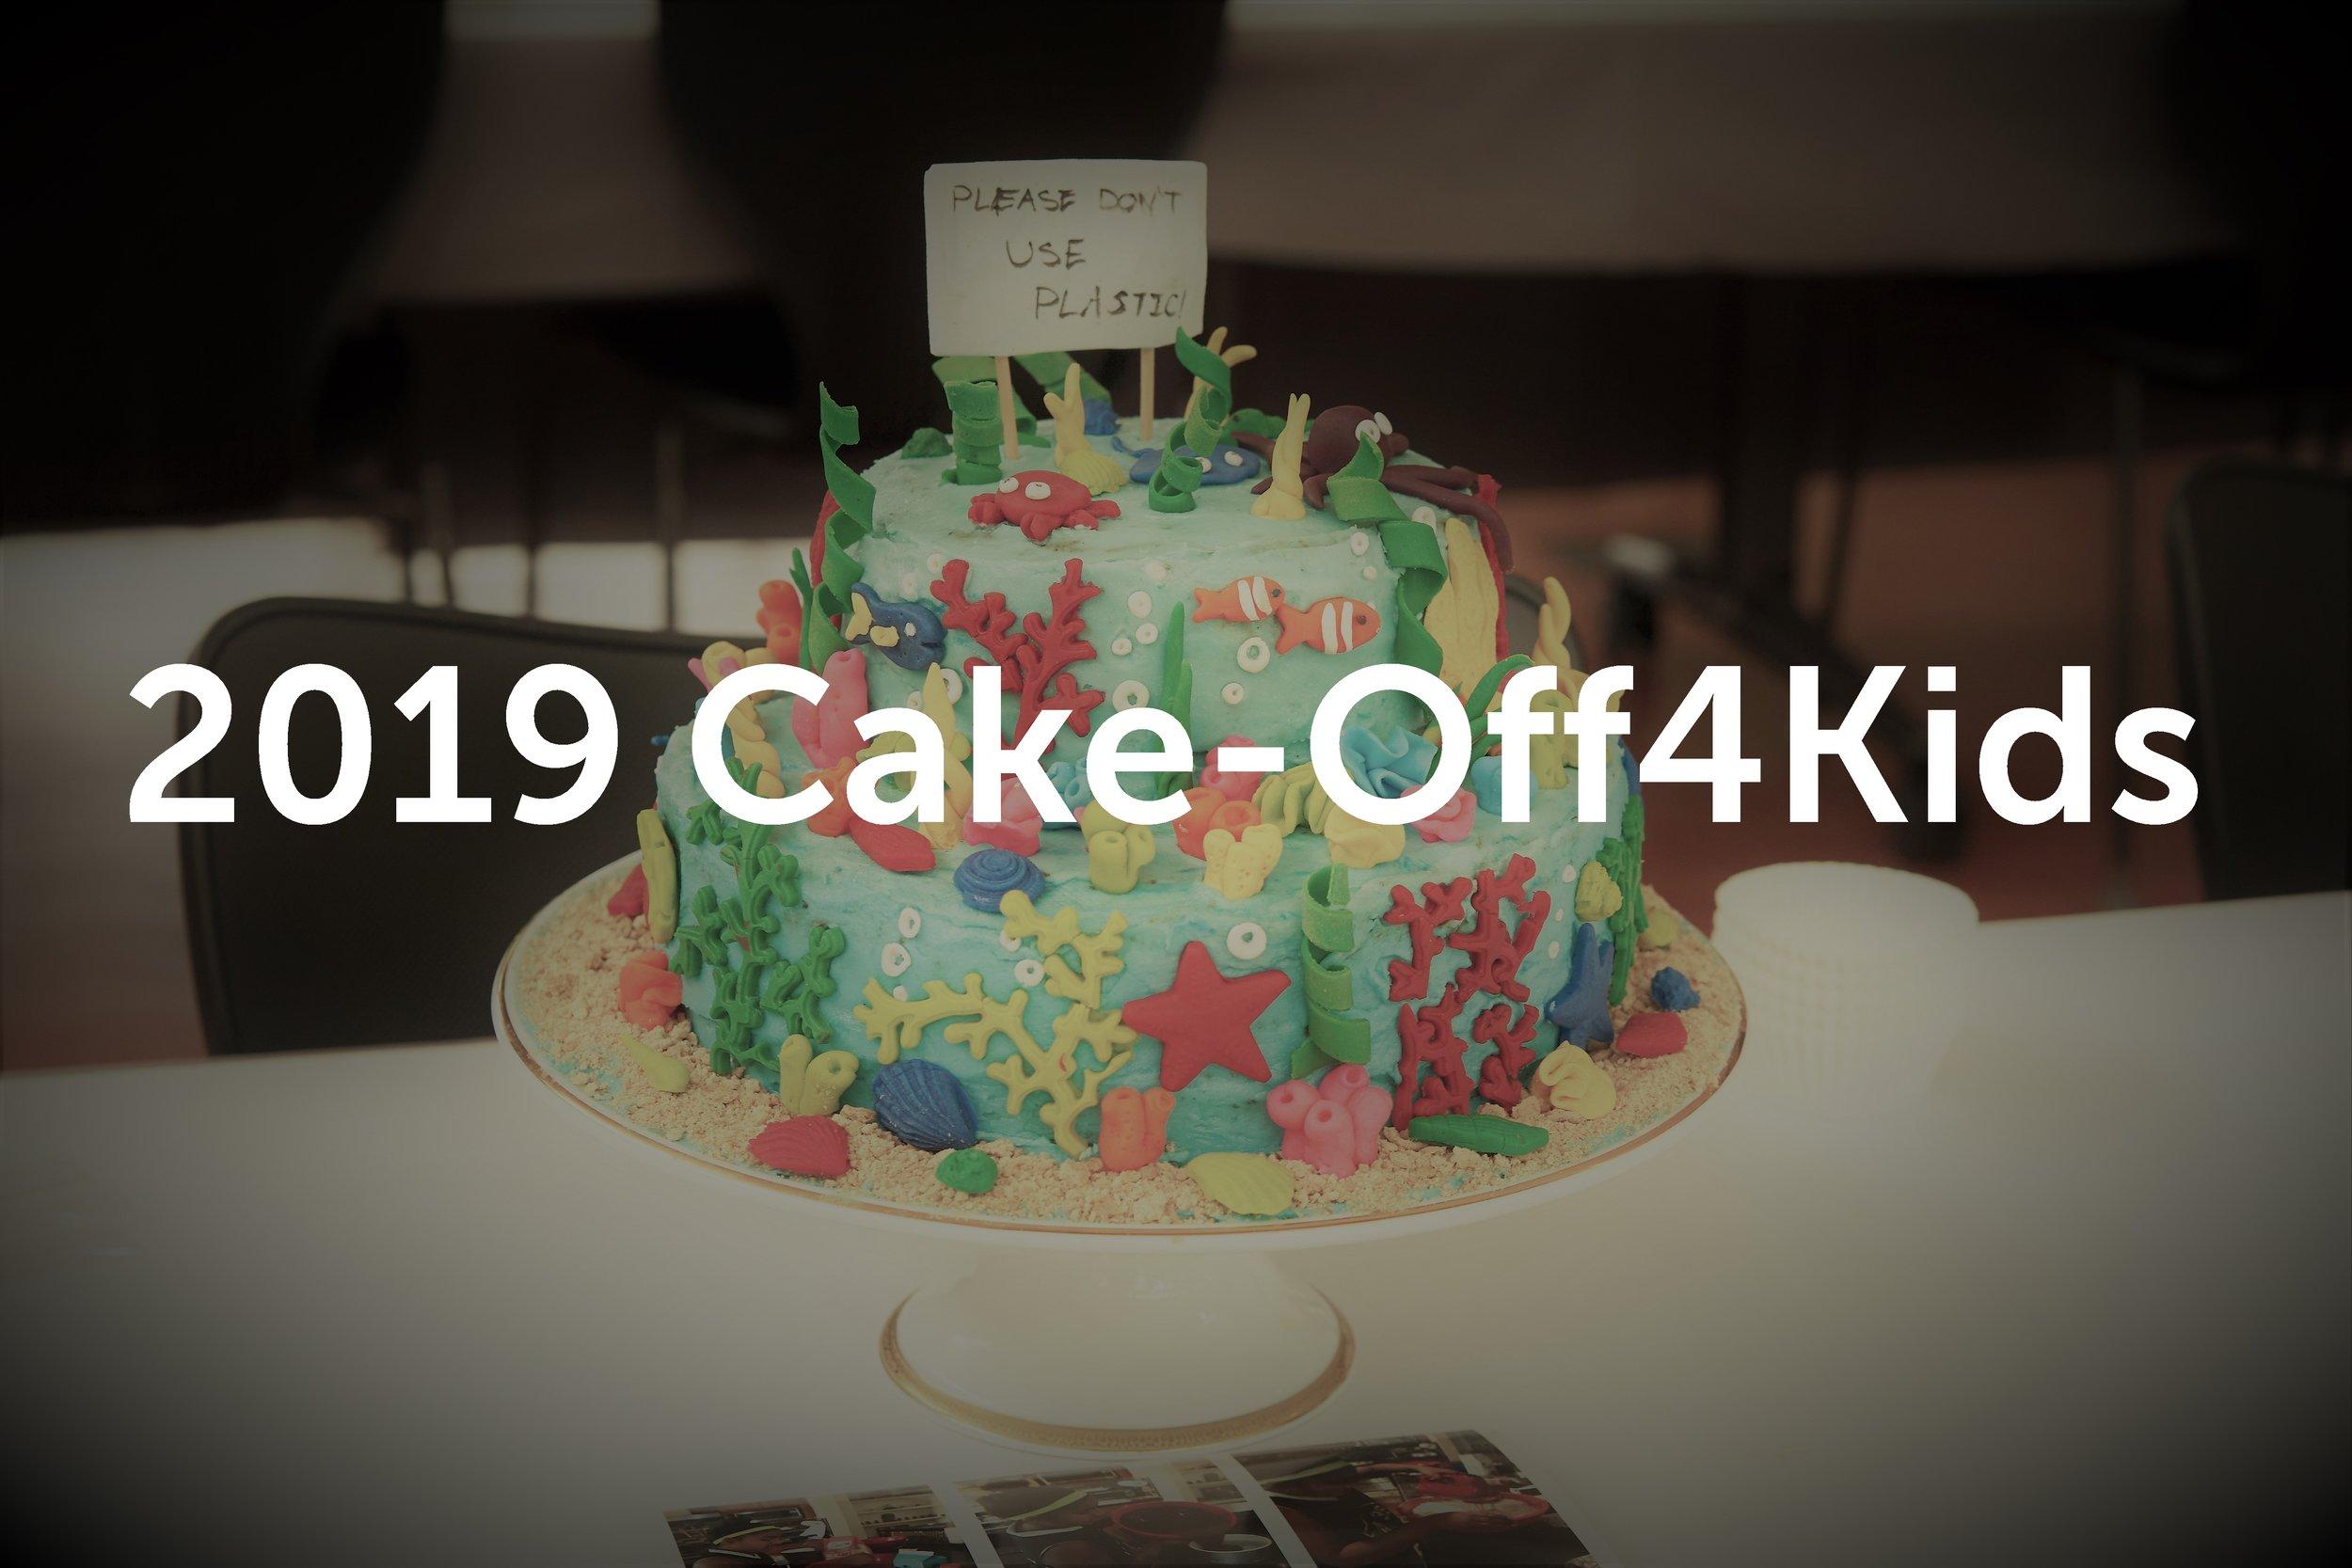 2019 Cake-Off4Kids Cover Photo.jpg